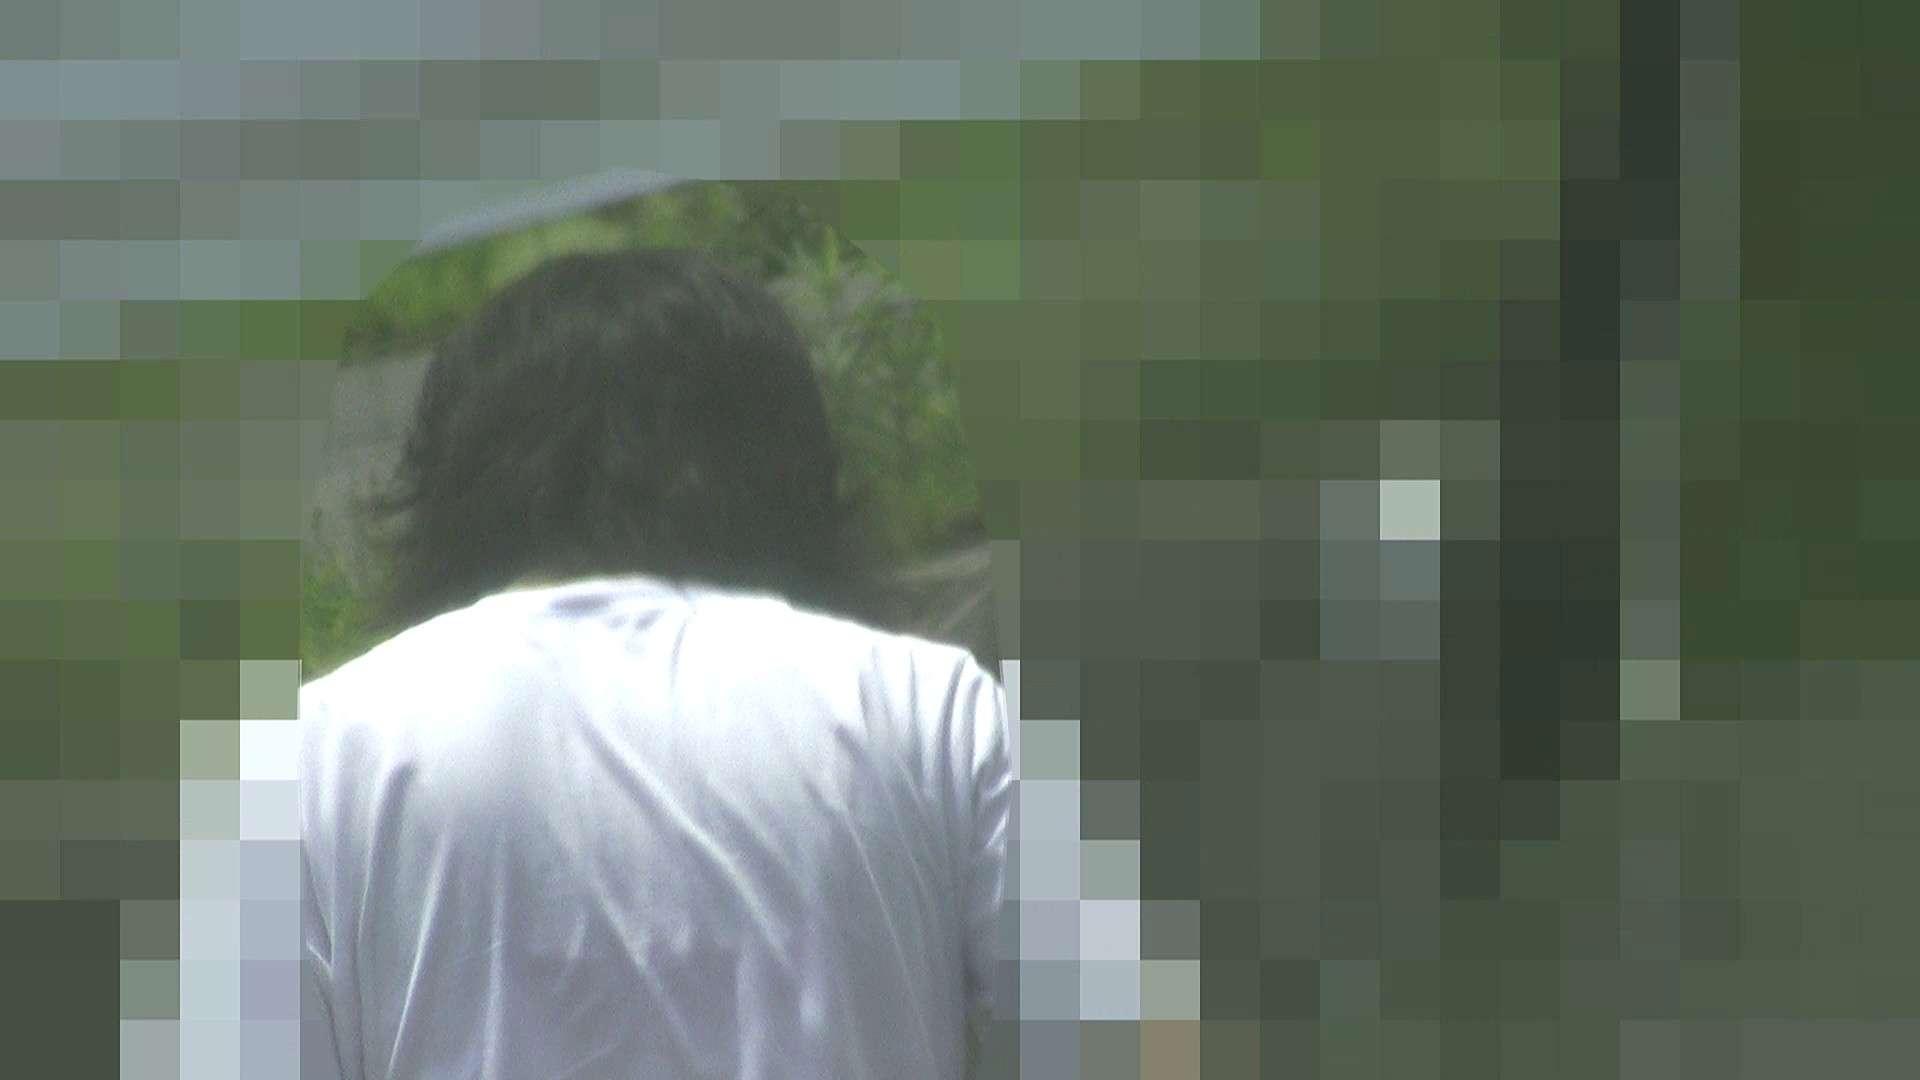 Aquaな露天風呂Vol.127 盗撮師作品 | 露天風呂突入  77pic 1